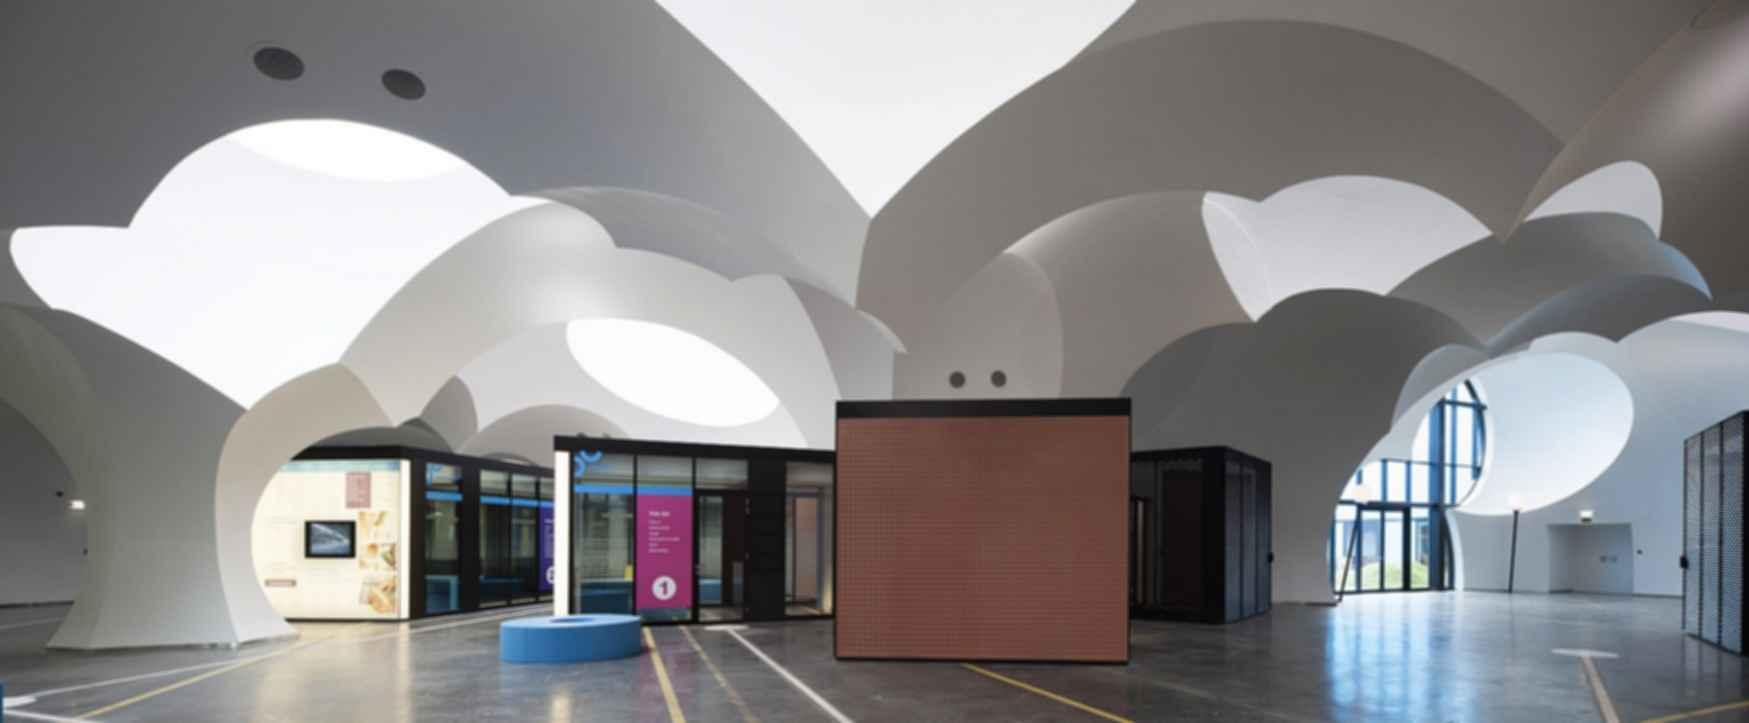 Oostcampus - Interior